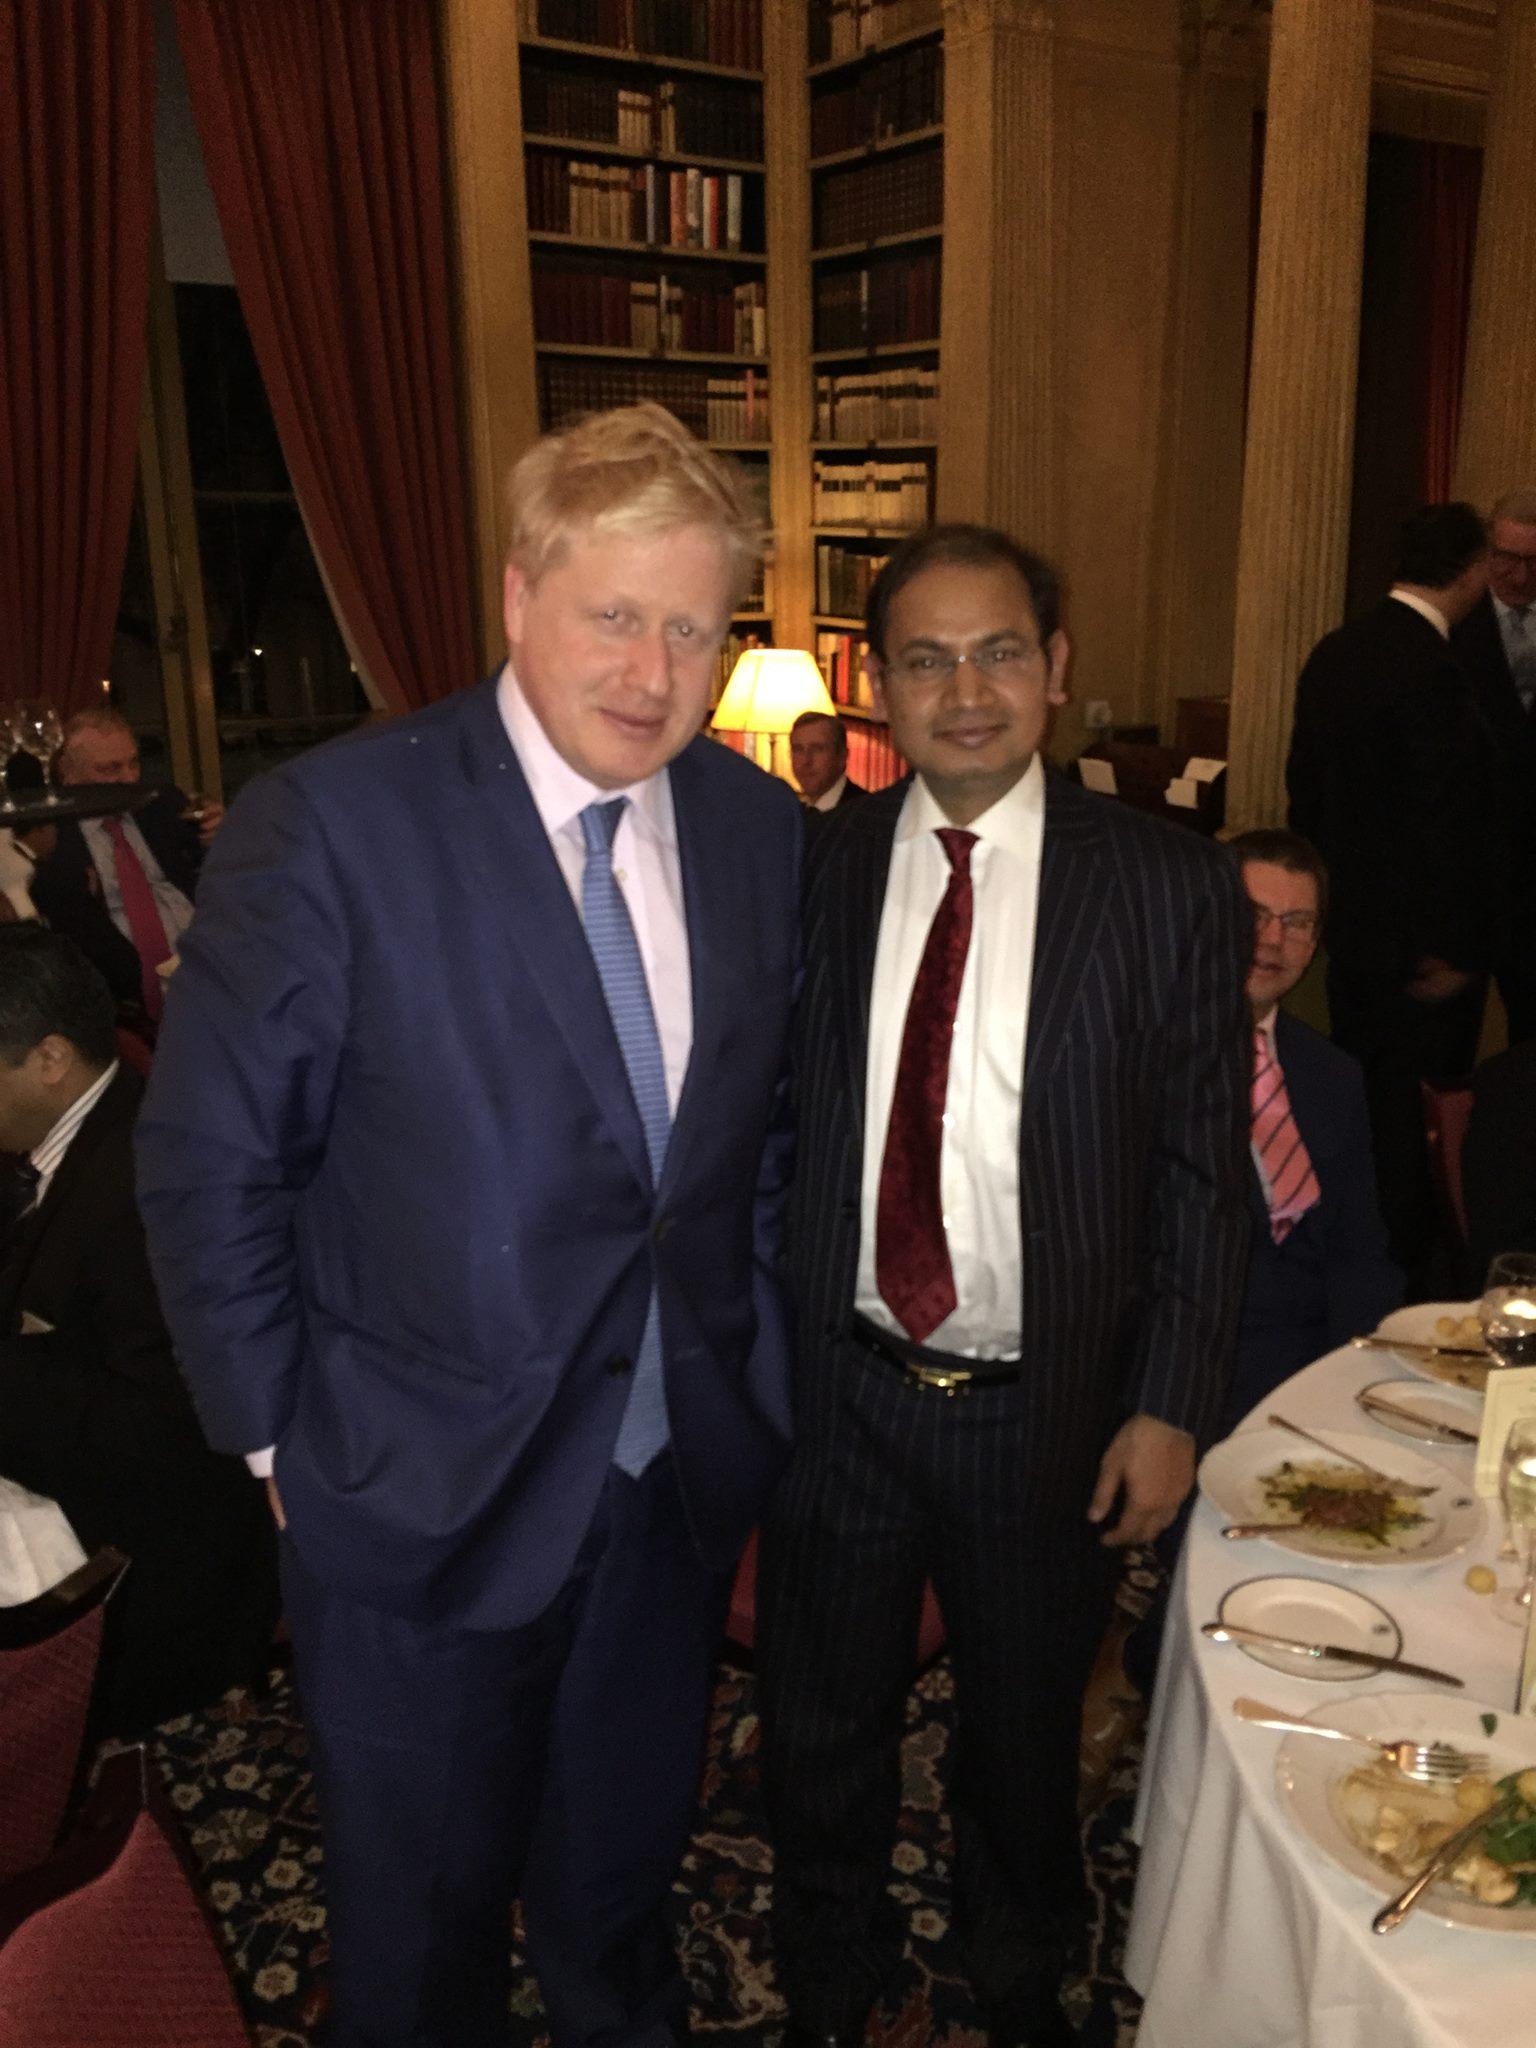 Dinner with Boris Johnson